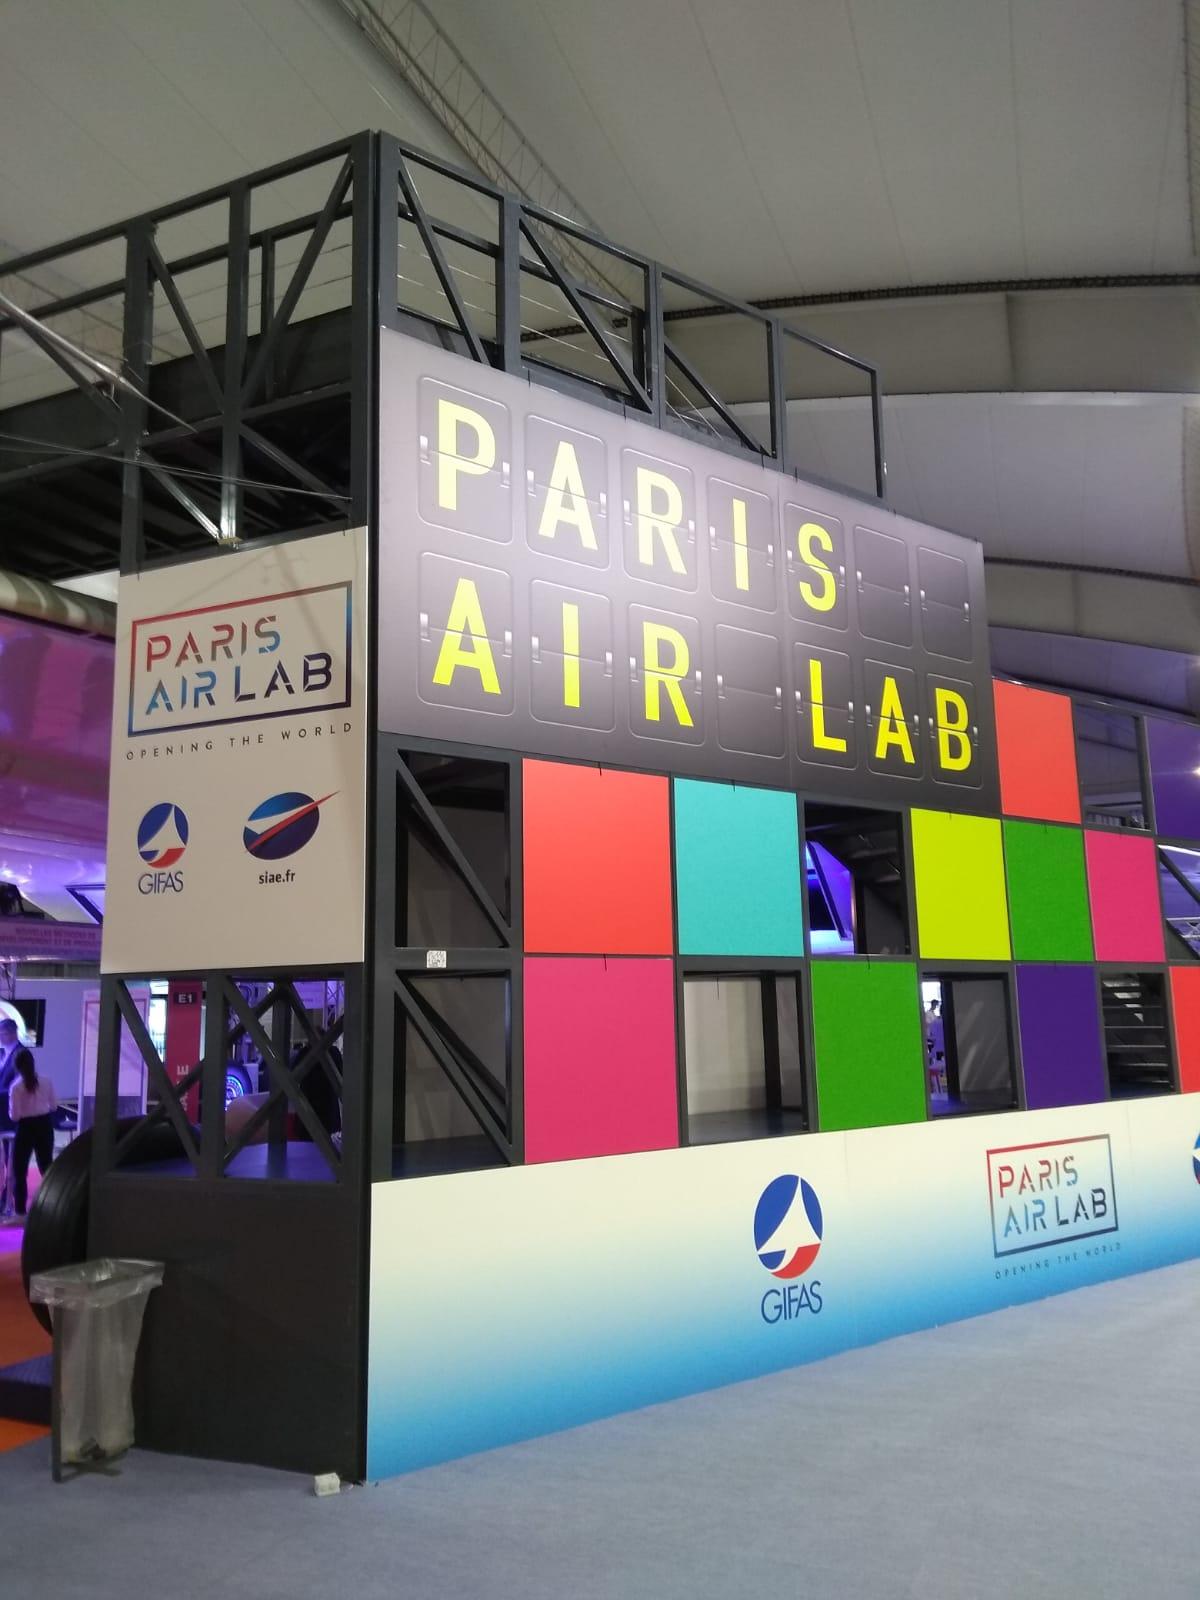 The Paris Air Lab